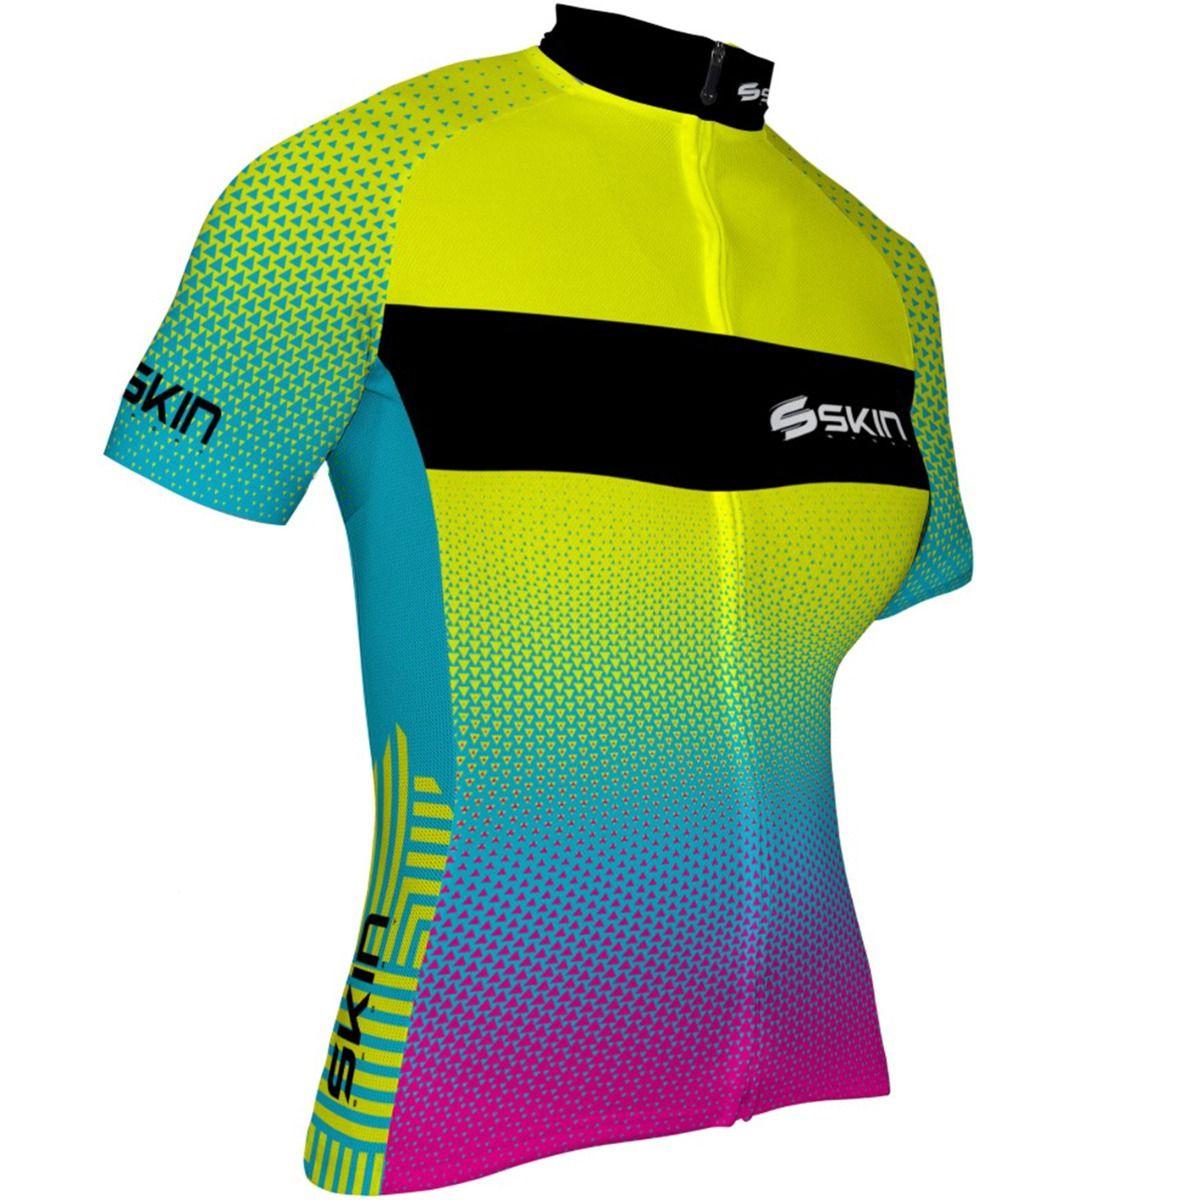 Camisa Ciclismo Feminina Skin Vênus Amarelo Azul Rosa - Loyal Bike ... 00066c87e61aa